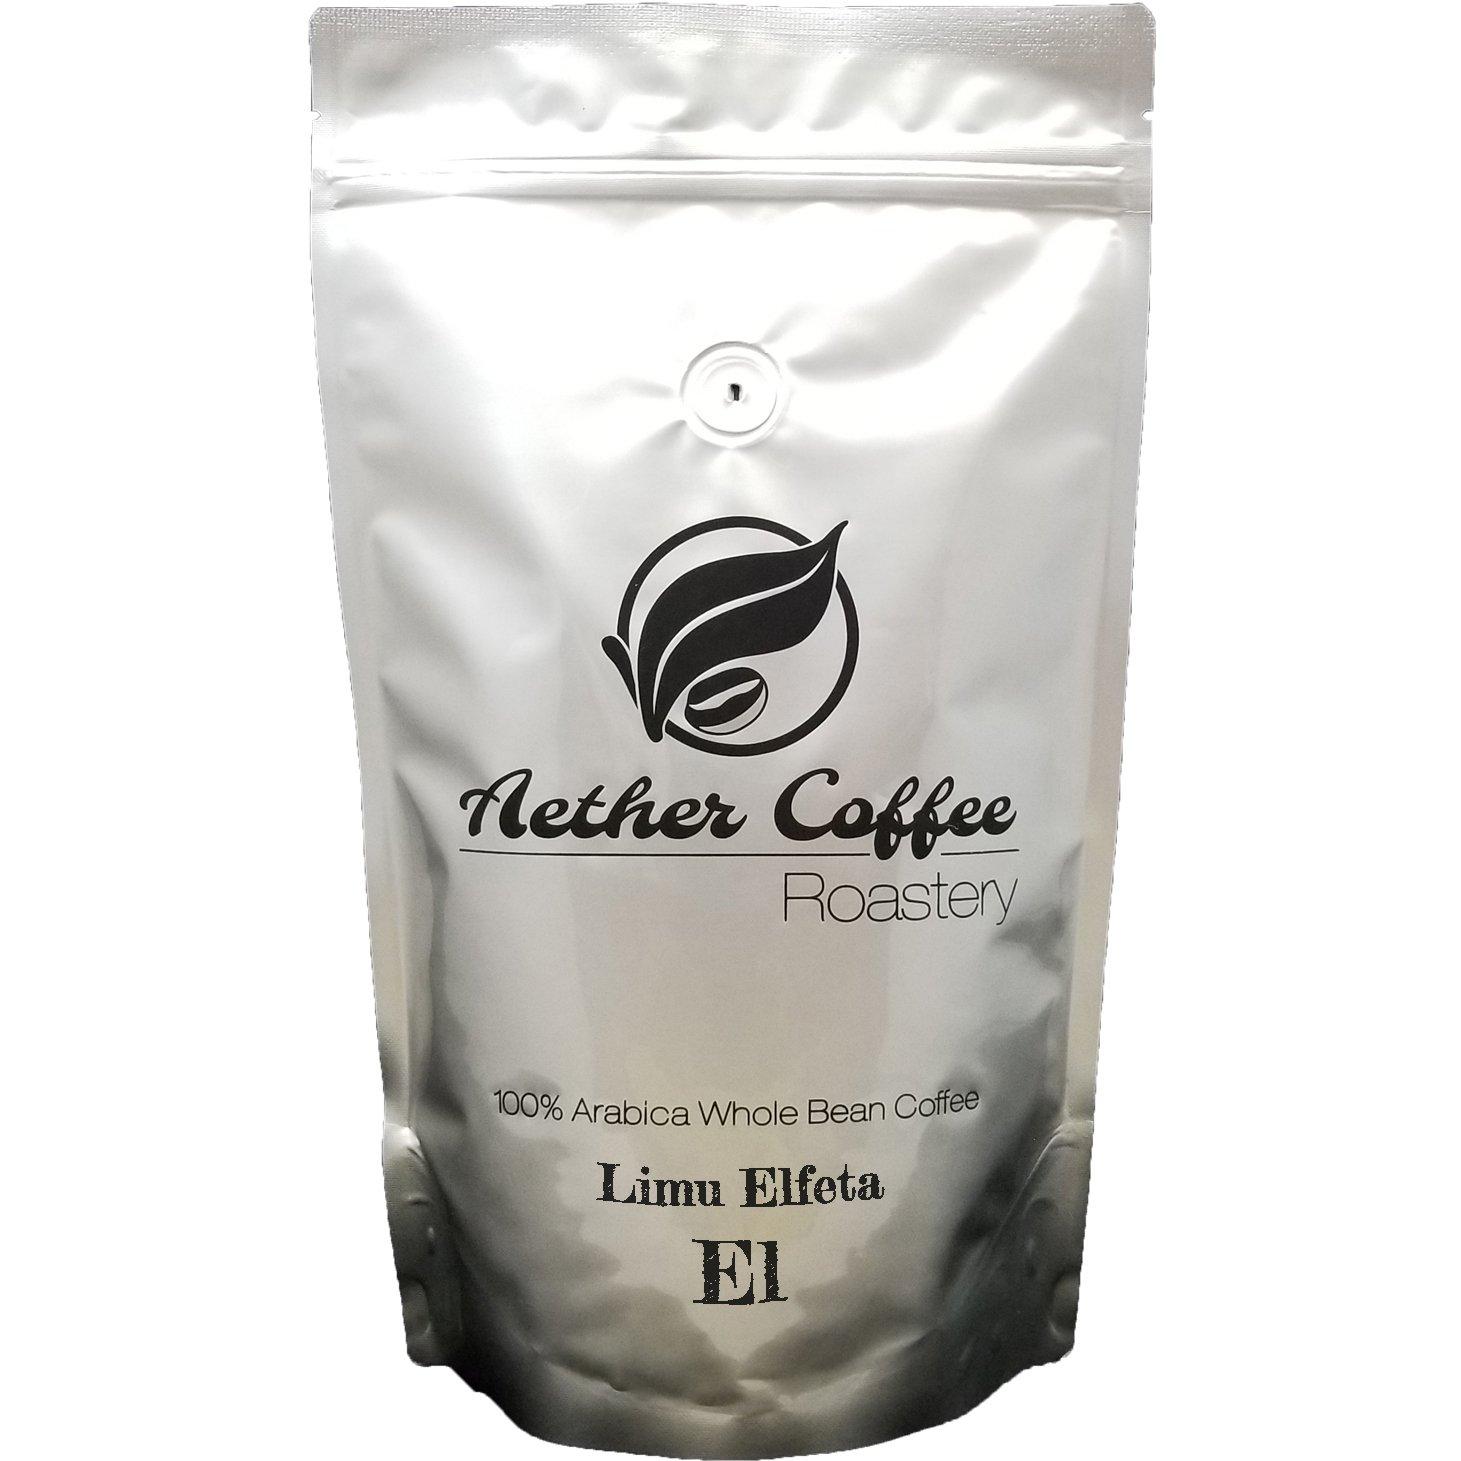 Aether Specialty Whole Bean Coffee - Single Origin - 1LB LIMU CHEFFE ELFETA (Ethiopia, Natural) - Light Medium Roast (Fruity Tart)